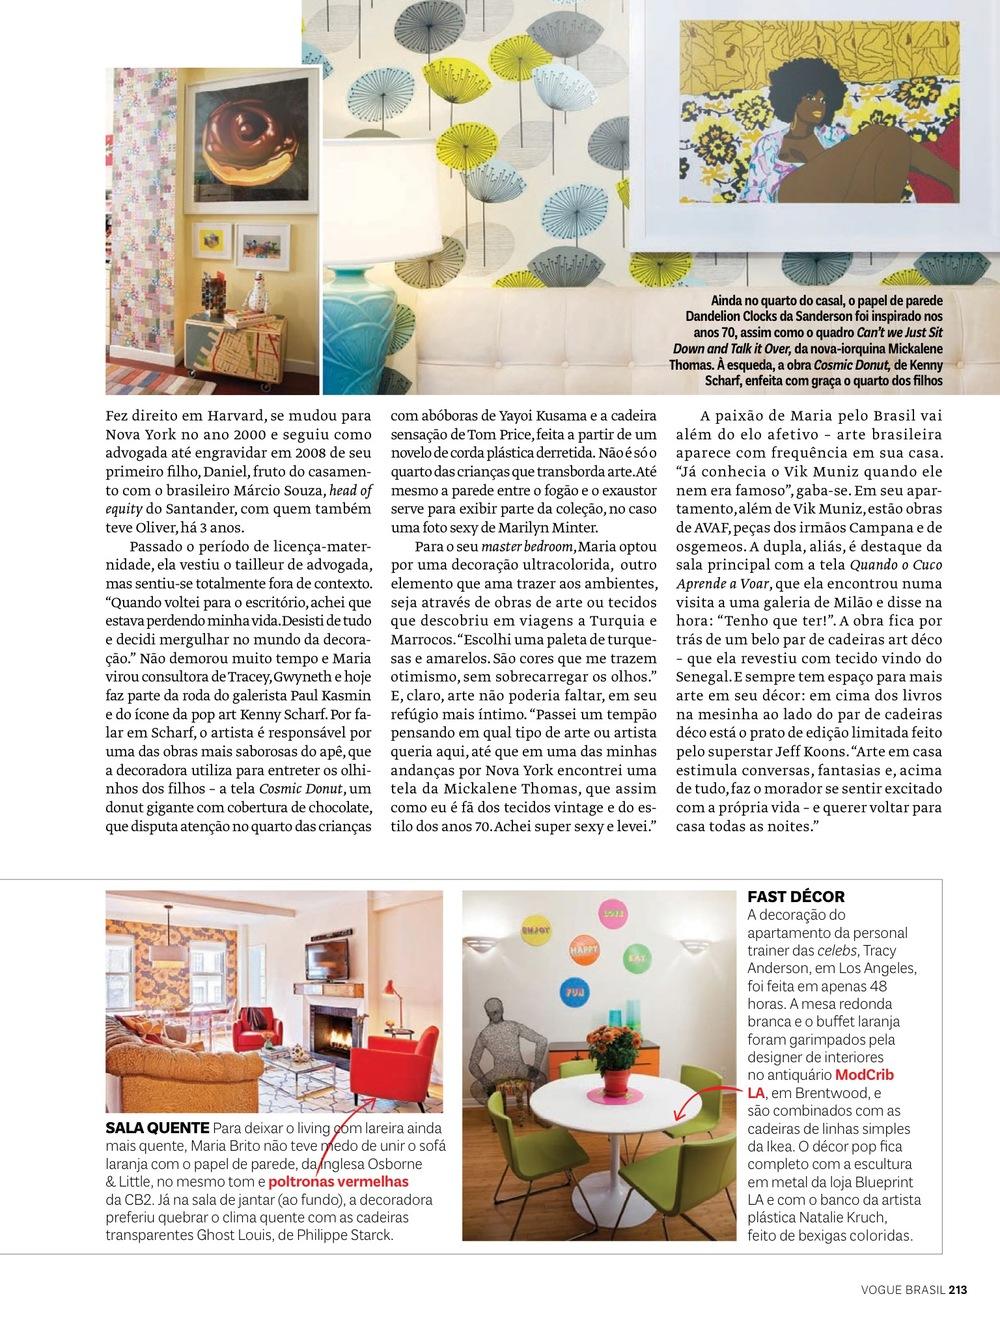 Vogue-Brazil-4.jpg